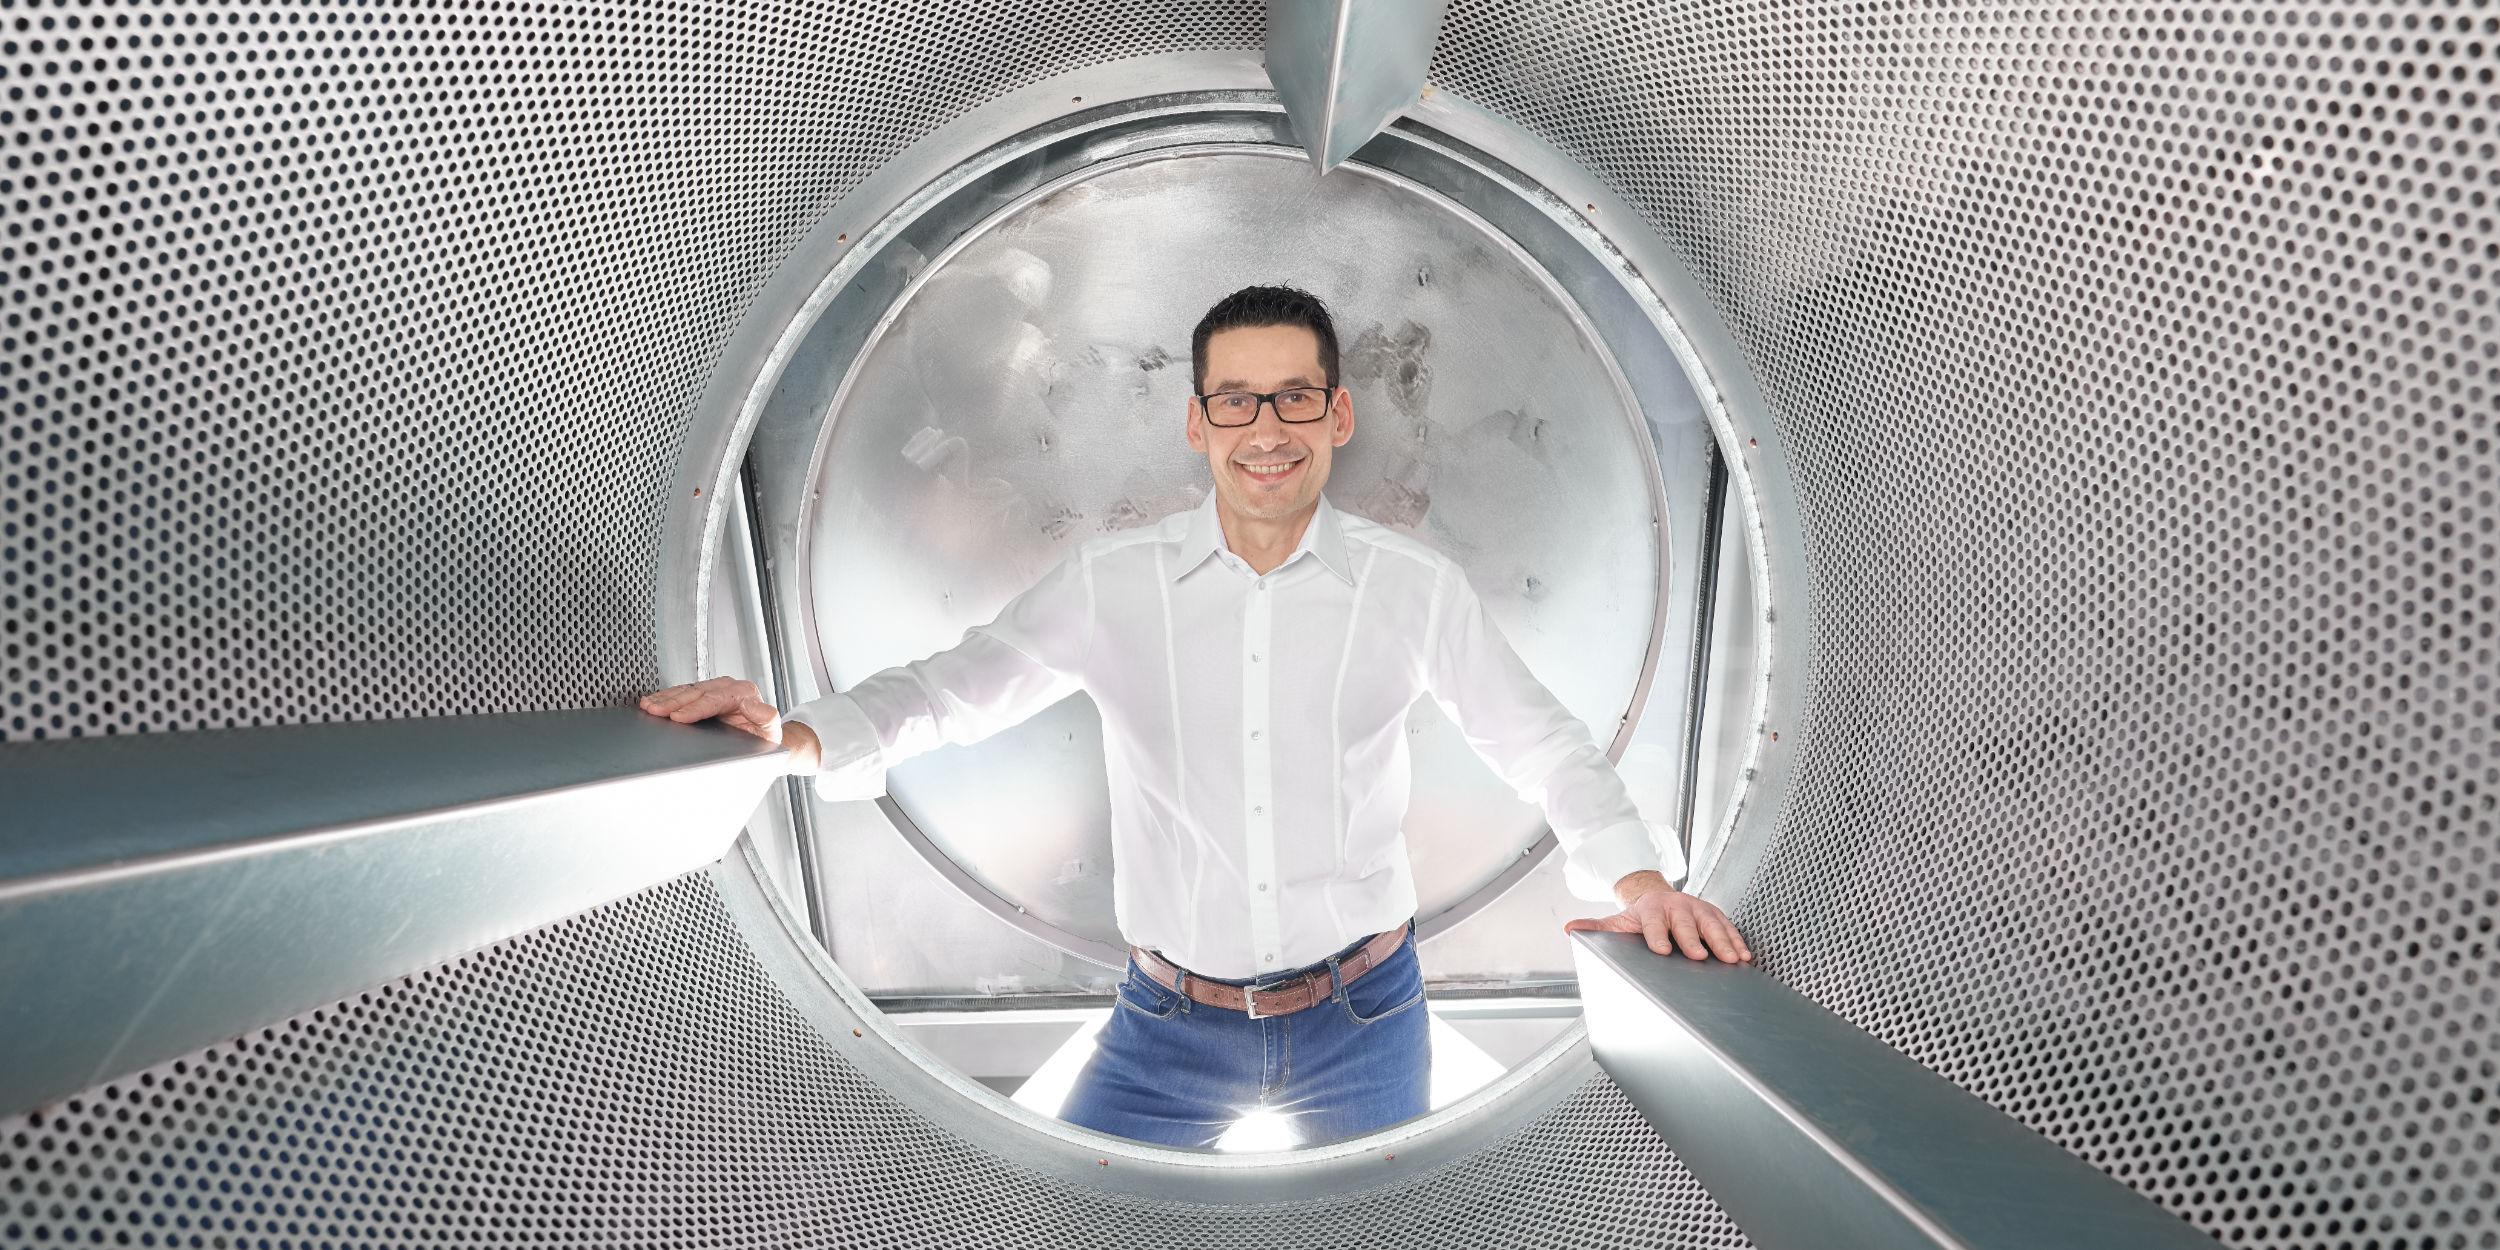 People Fotografie Stuttgart und Umgebung Charakter Portrait Forstenhäussler Ludwigsburg Waschmaschine weisses Hemd Blue Jeans